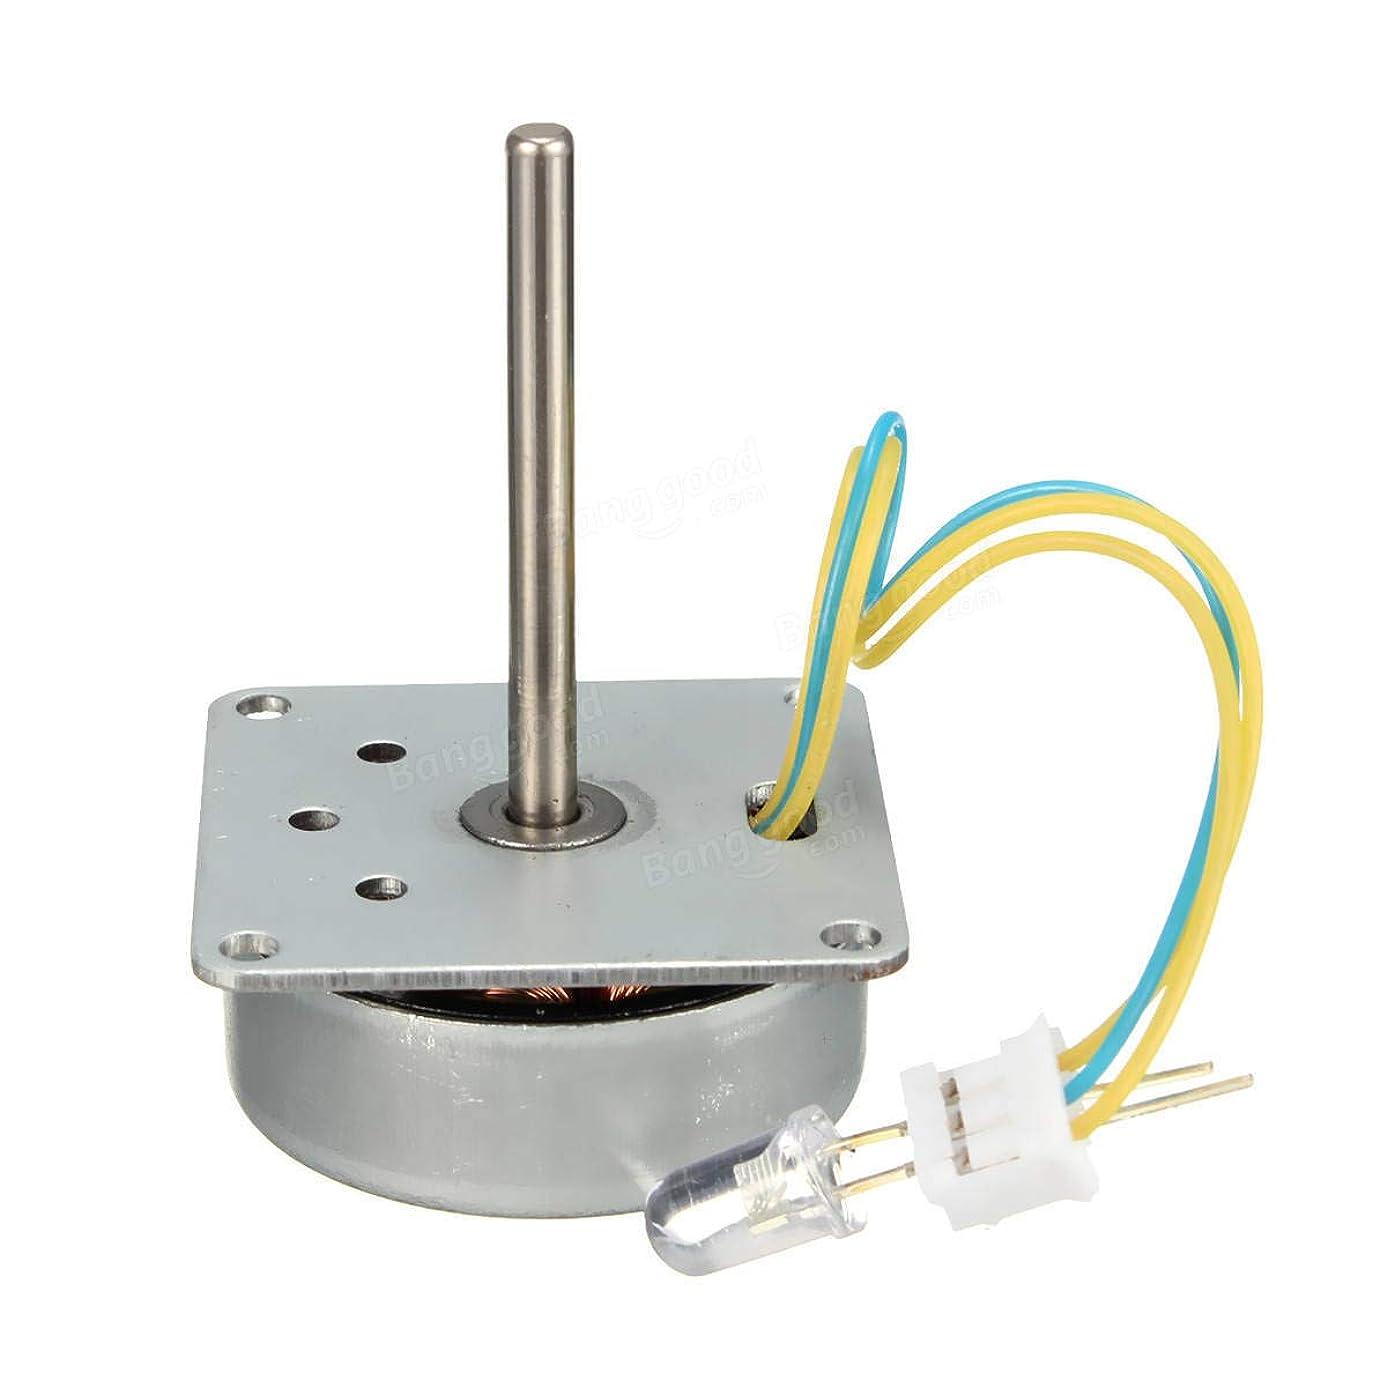 3Pcs 3V-24V 12V Mini 3-phase Generator Wind Turbines Motor - Arduino Compatible SCM & DIY Kits Smart Robot & Solar Panel - 3 x Micro generator